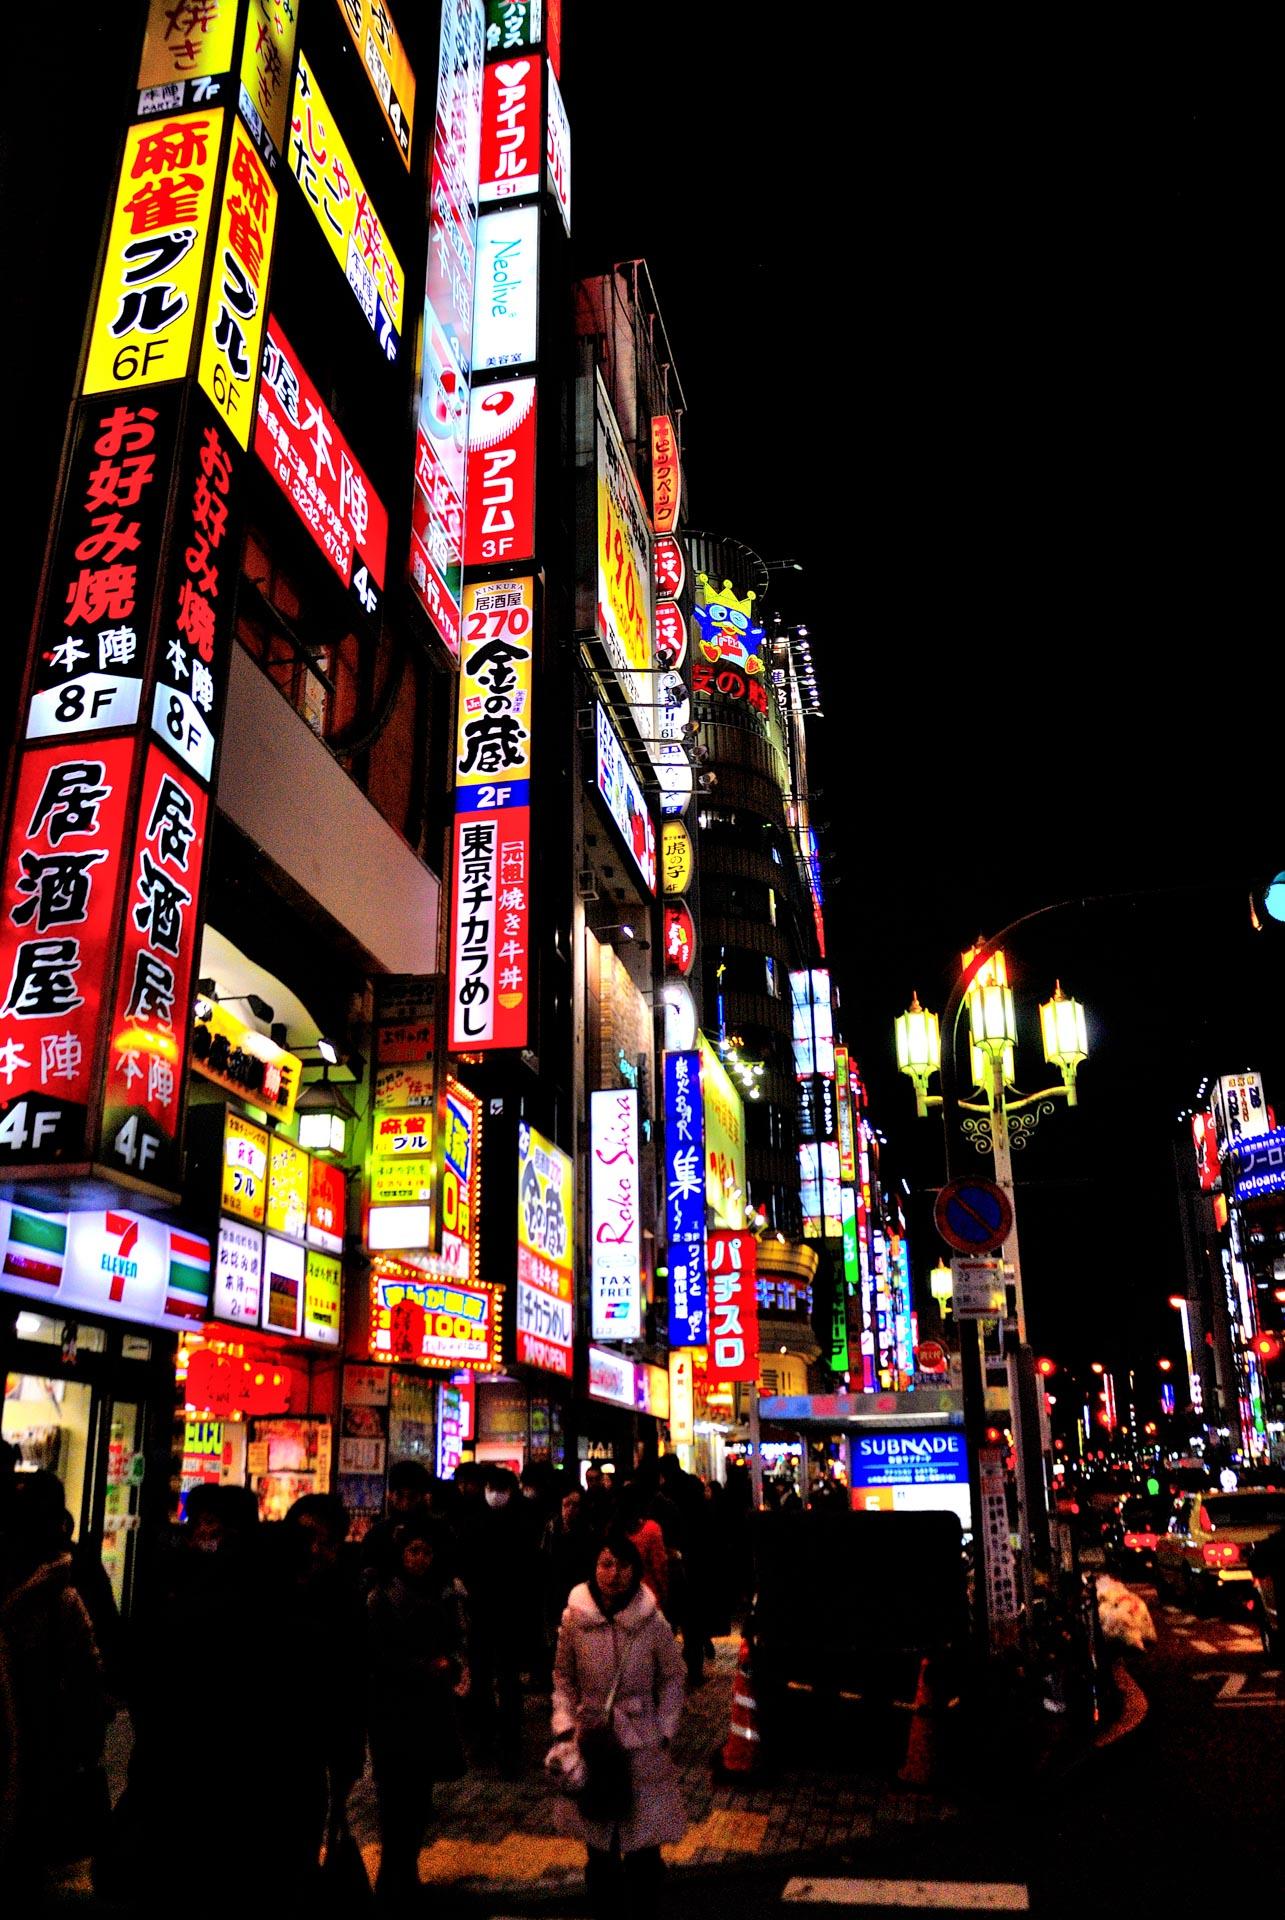 Tokyo, Japan - city that never sleeps